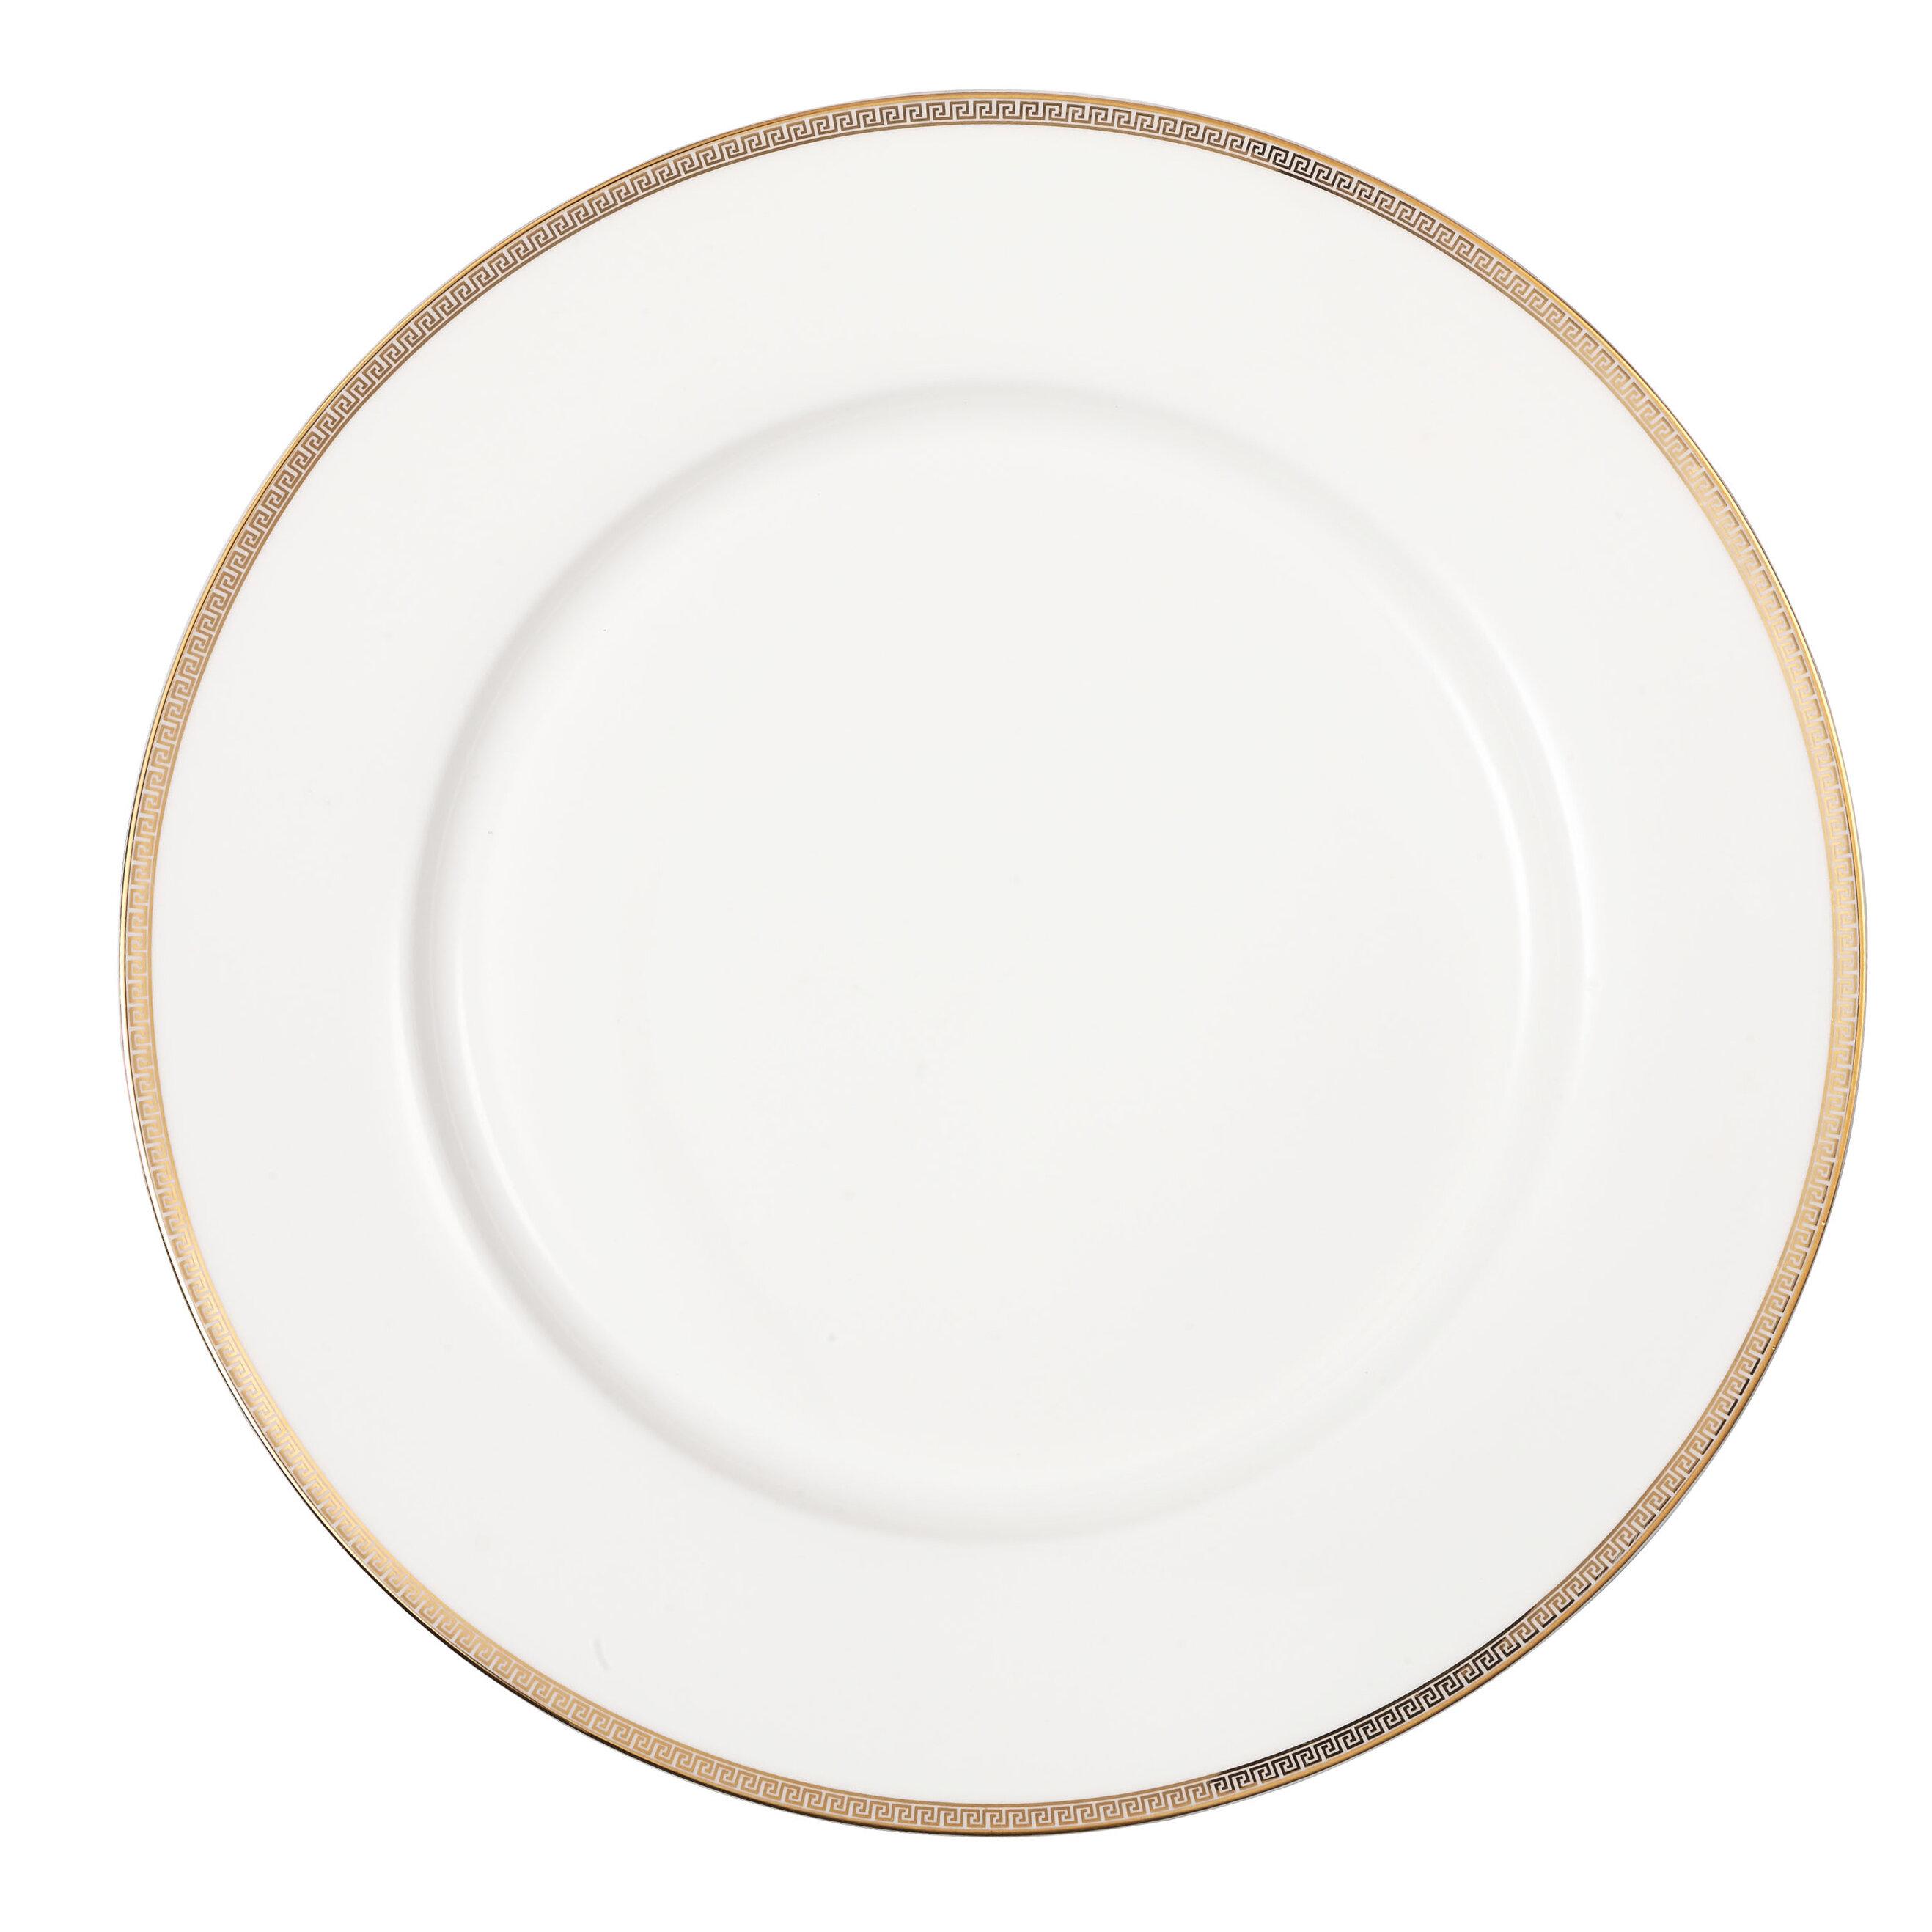 Lorren Home Trends Bone China 57 Piece Dinnerware Set Service for 8 \u0026 Reviews | Wayfair  sc 1 st  Wayfair & Lorren Home Trends Bone China 57 Piece Dinnerware Set Service for 8 ...